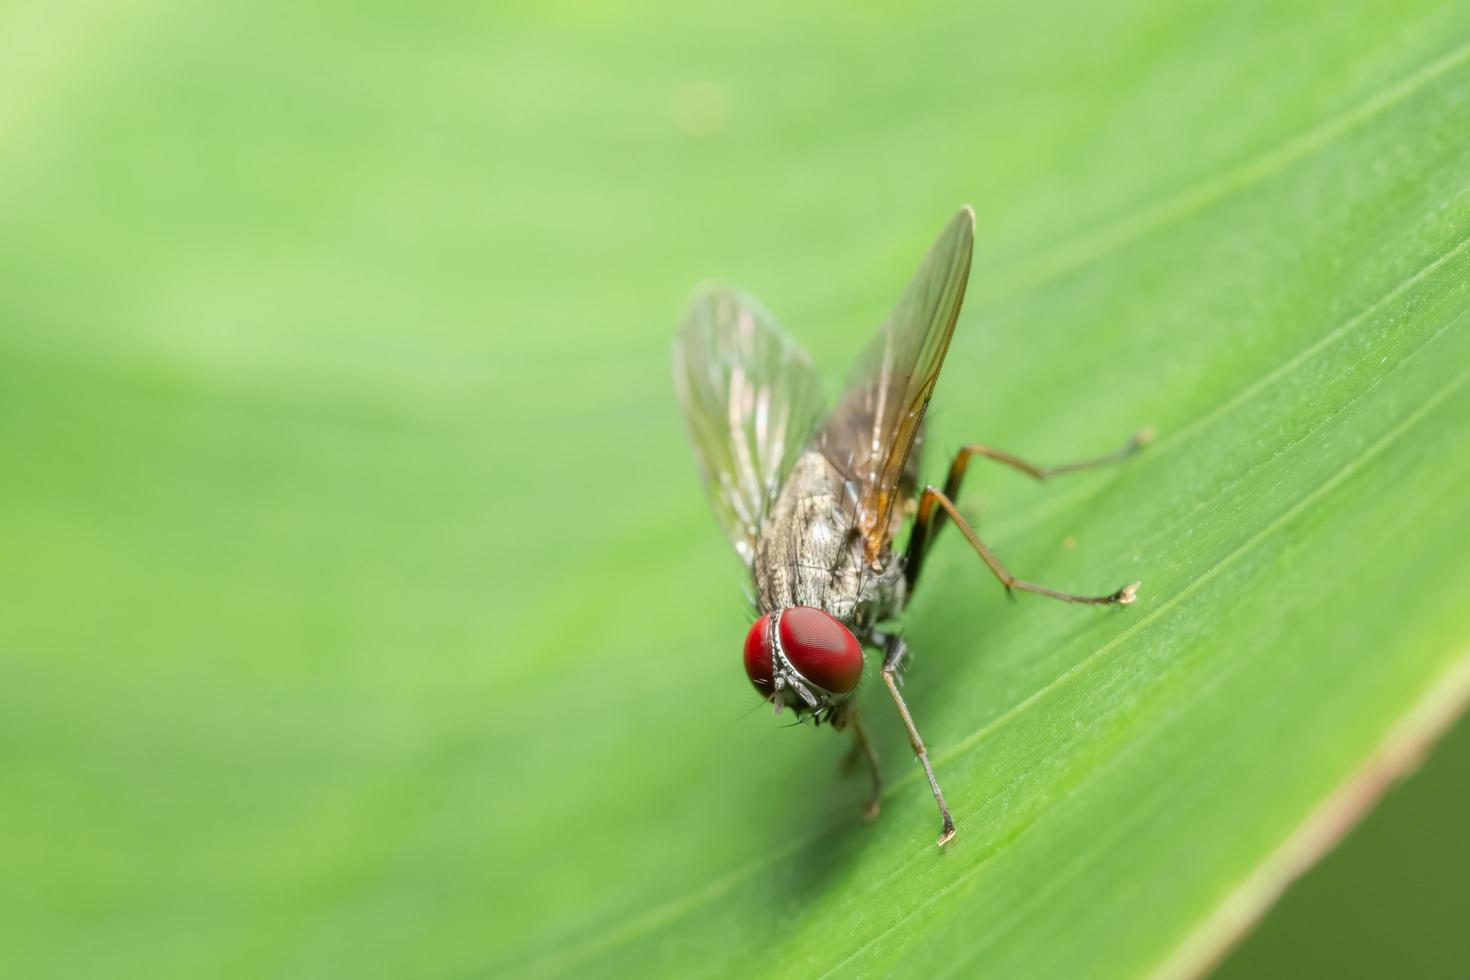 fliege auf grünem Blatt foto